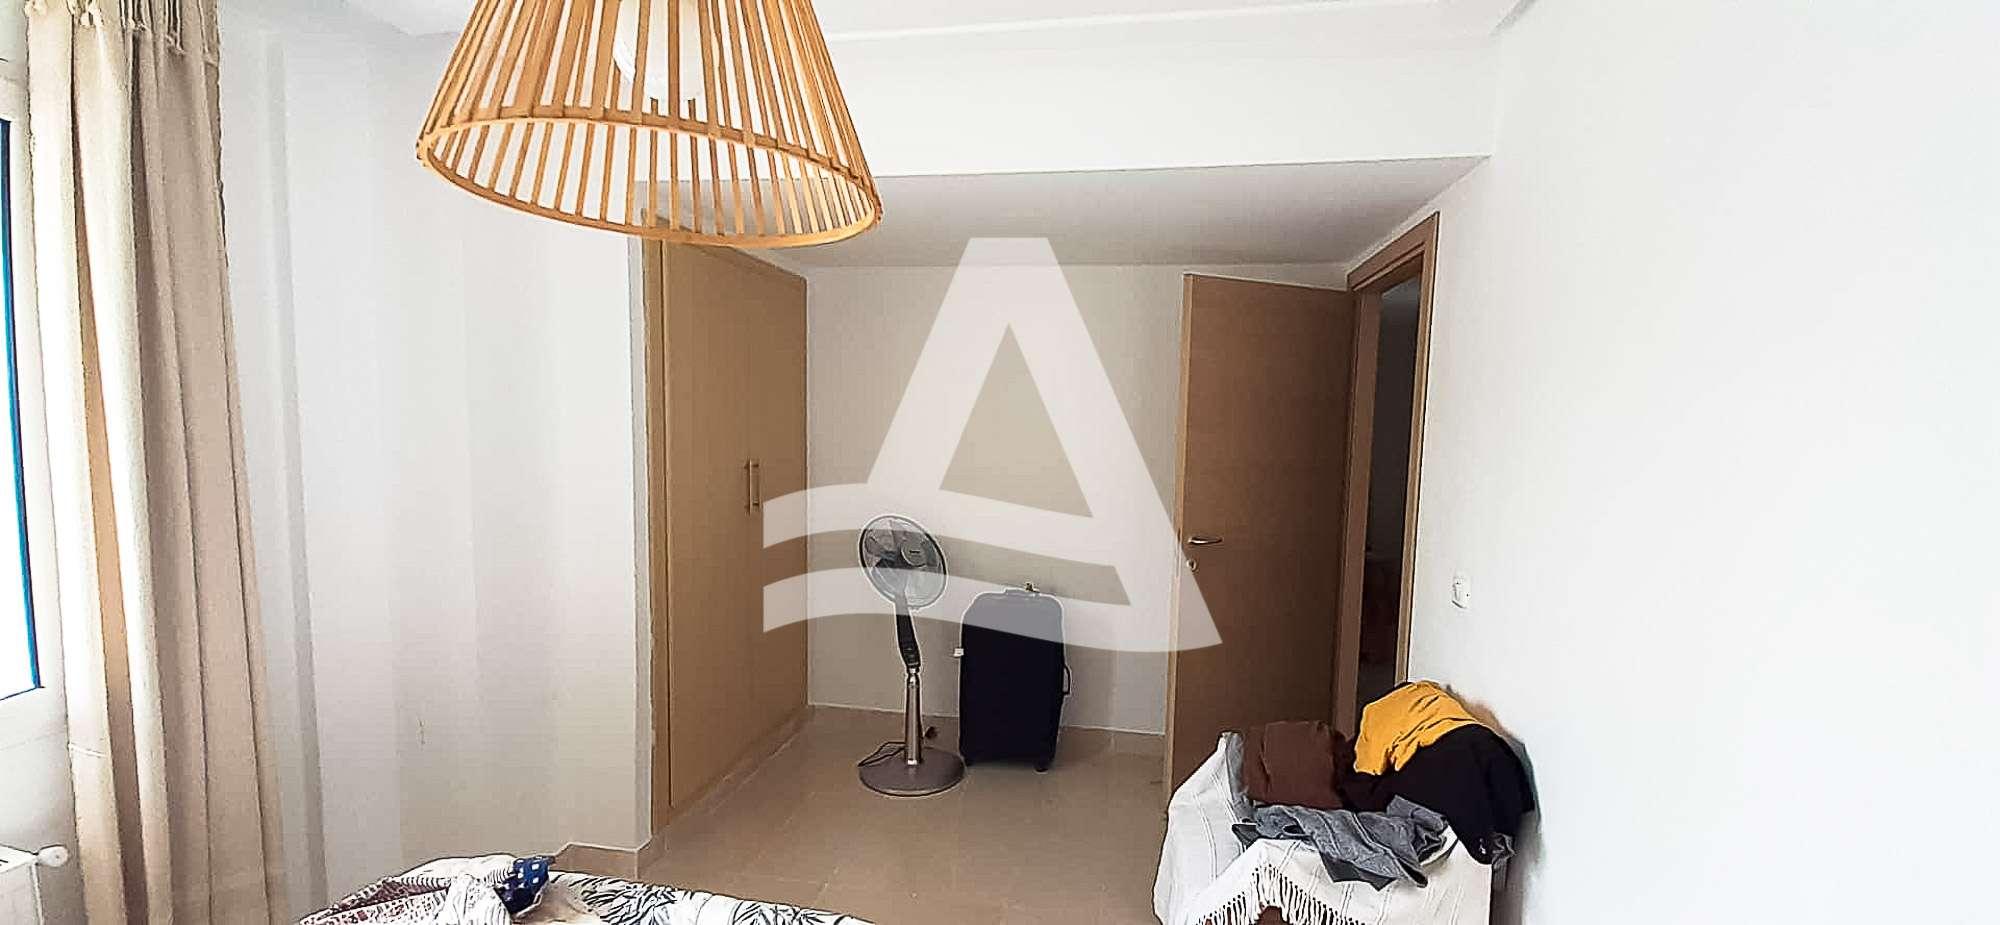 httpss3.amazonaws.comlogimoaws_Arcane_immobilière_la_Marsa-_location_-_vente_la_marsa_5_sur_12_1574441790483